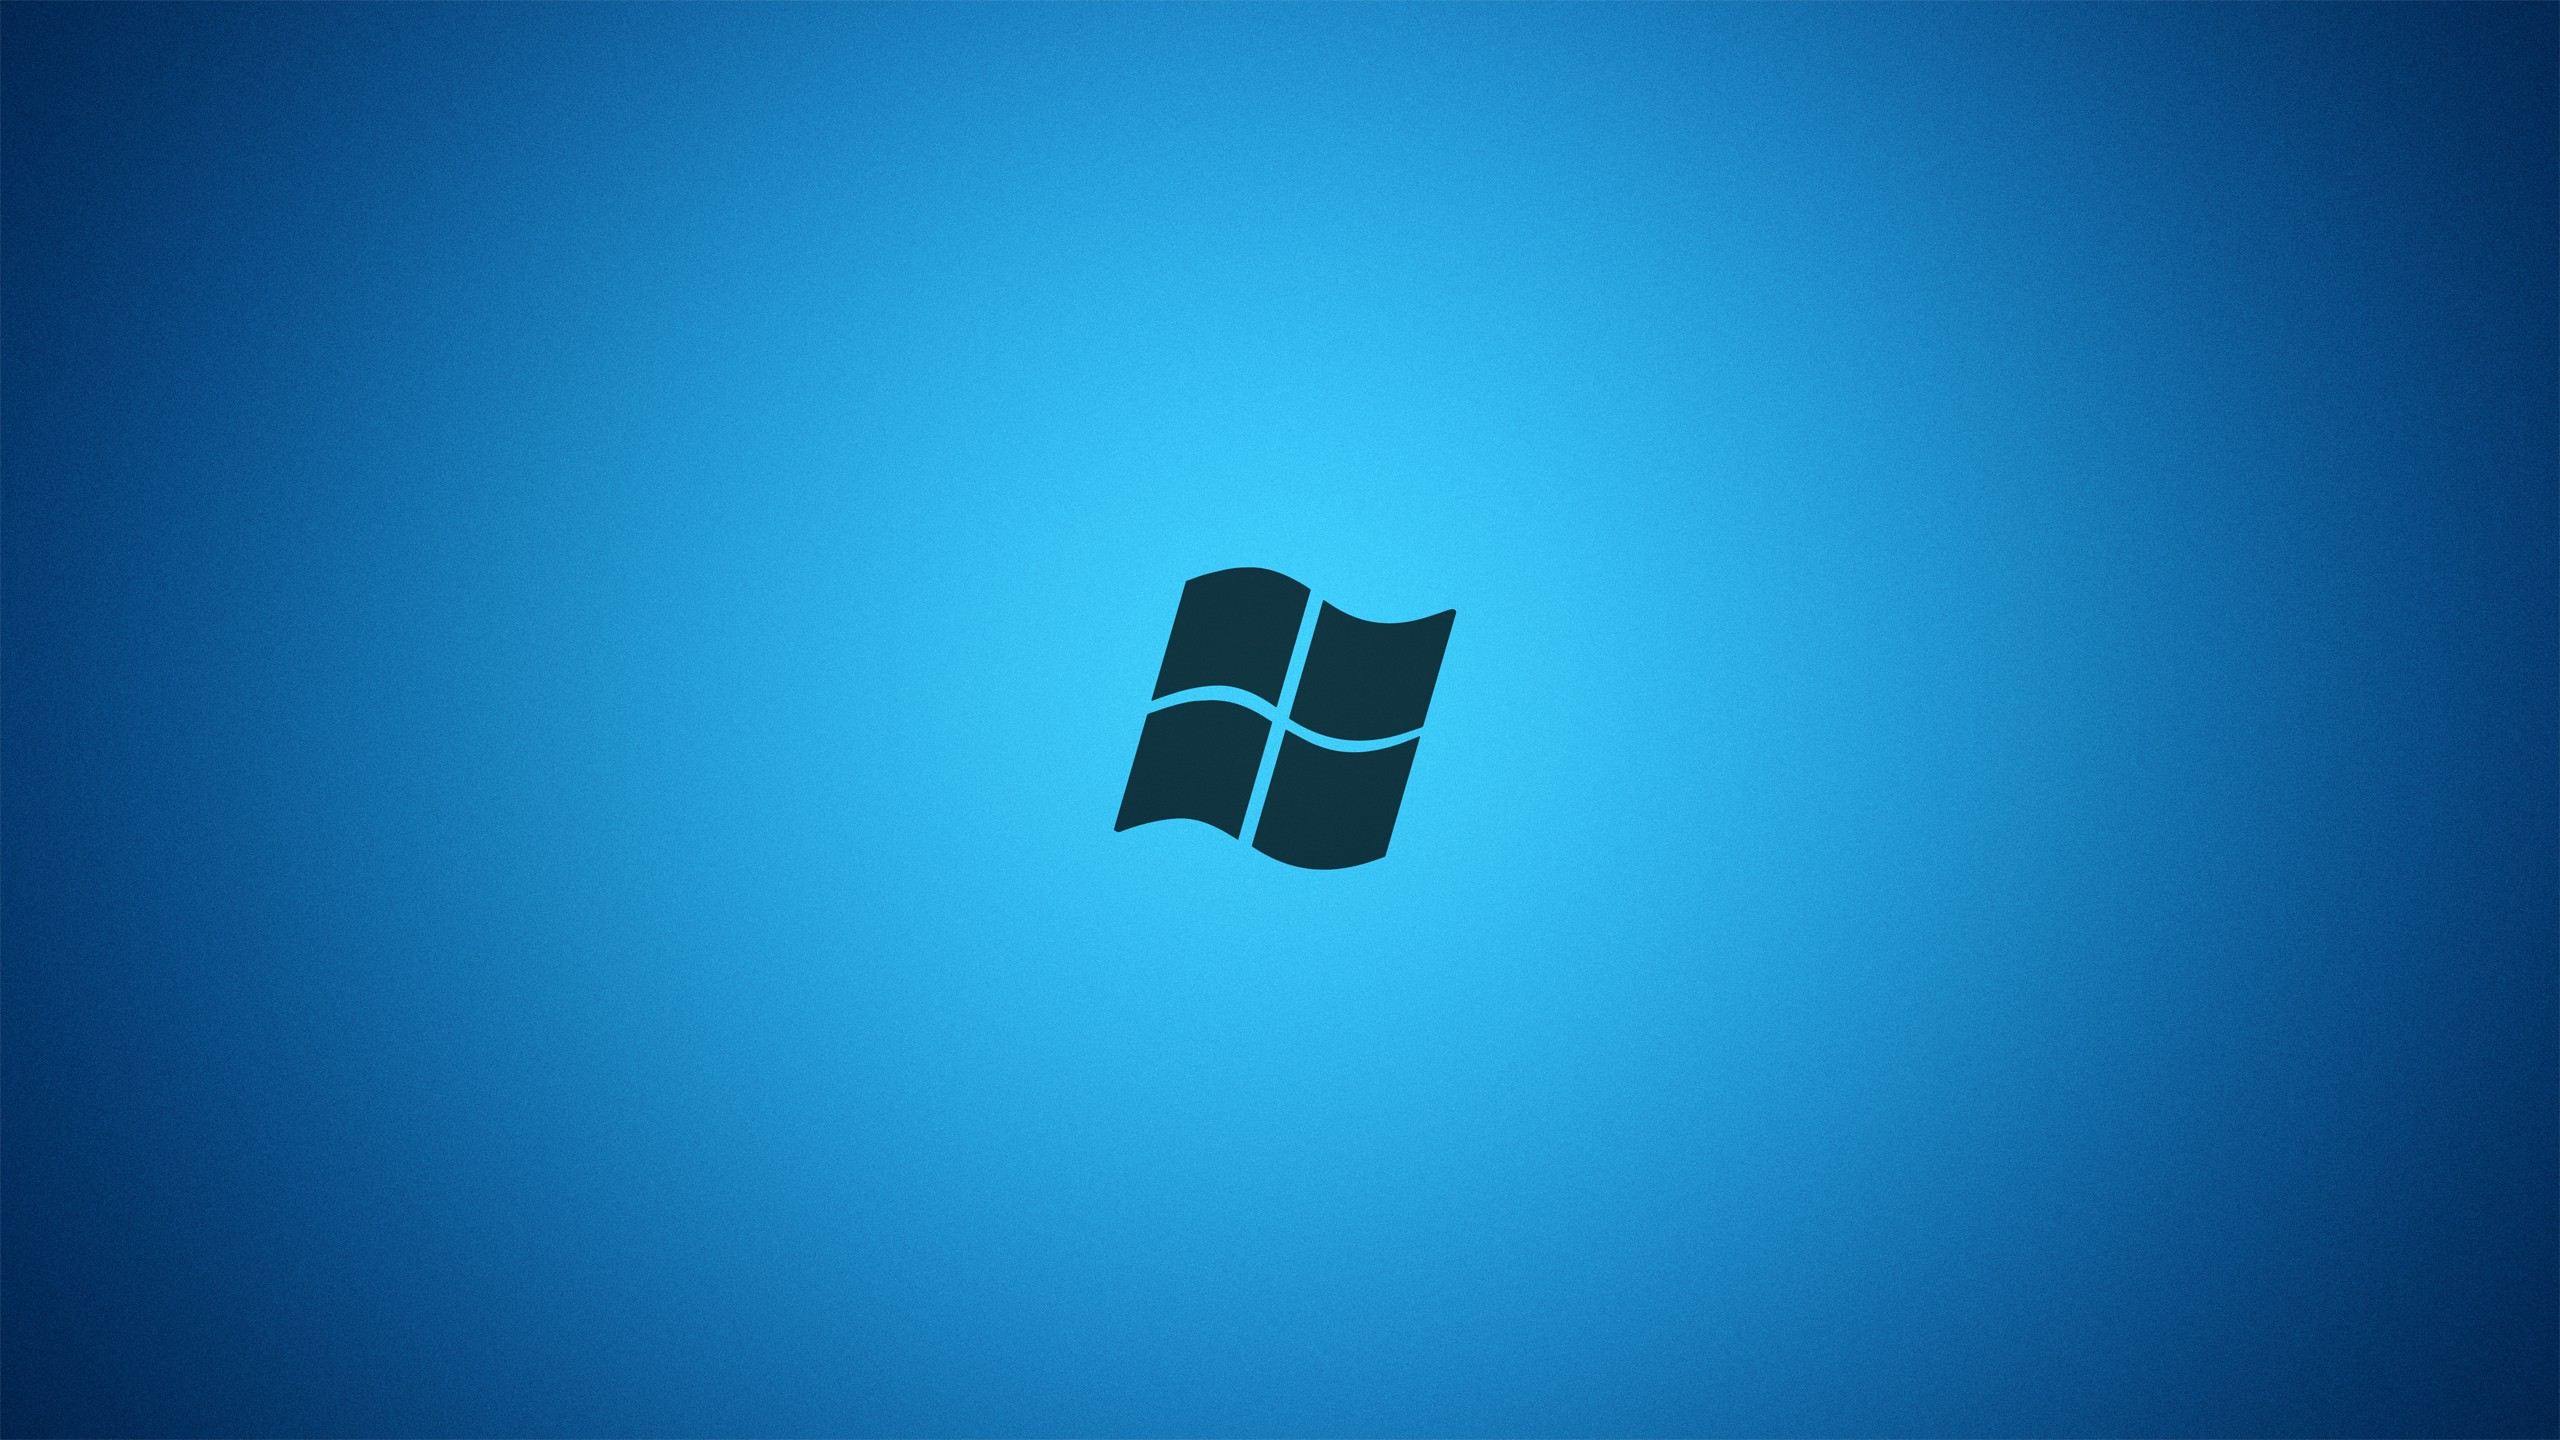 Plain glass windows - Hd Windows Logo Wallpapers Wallpapersafari